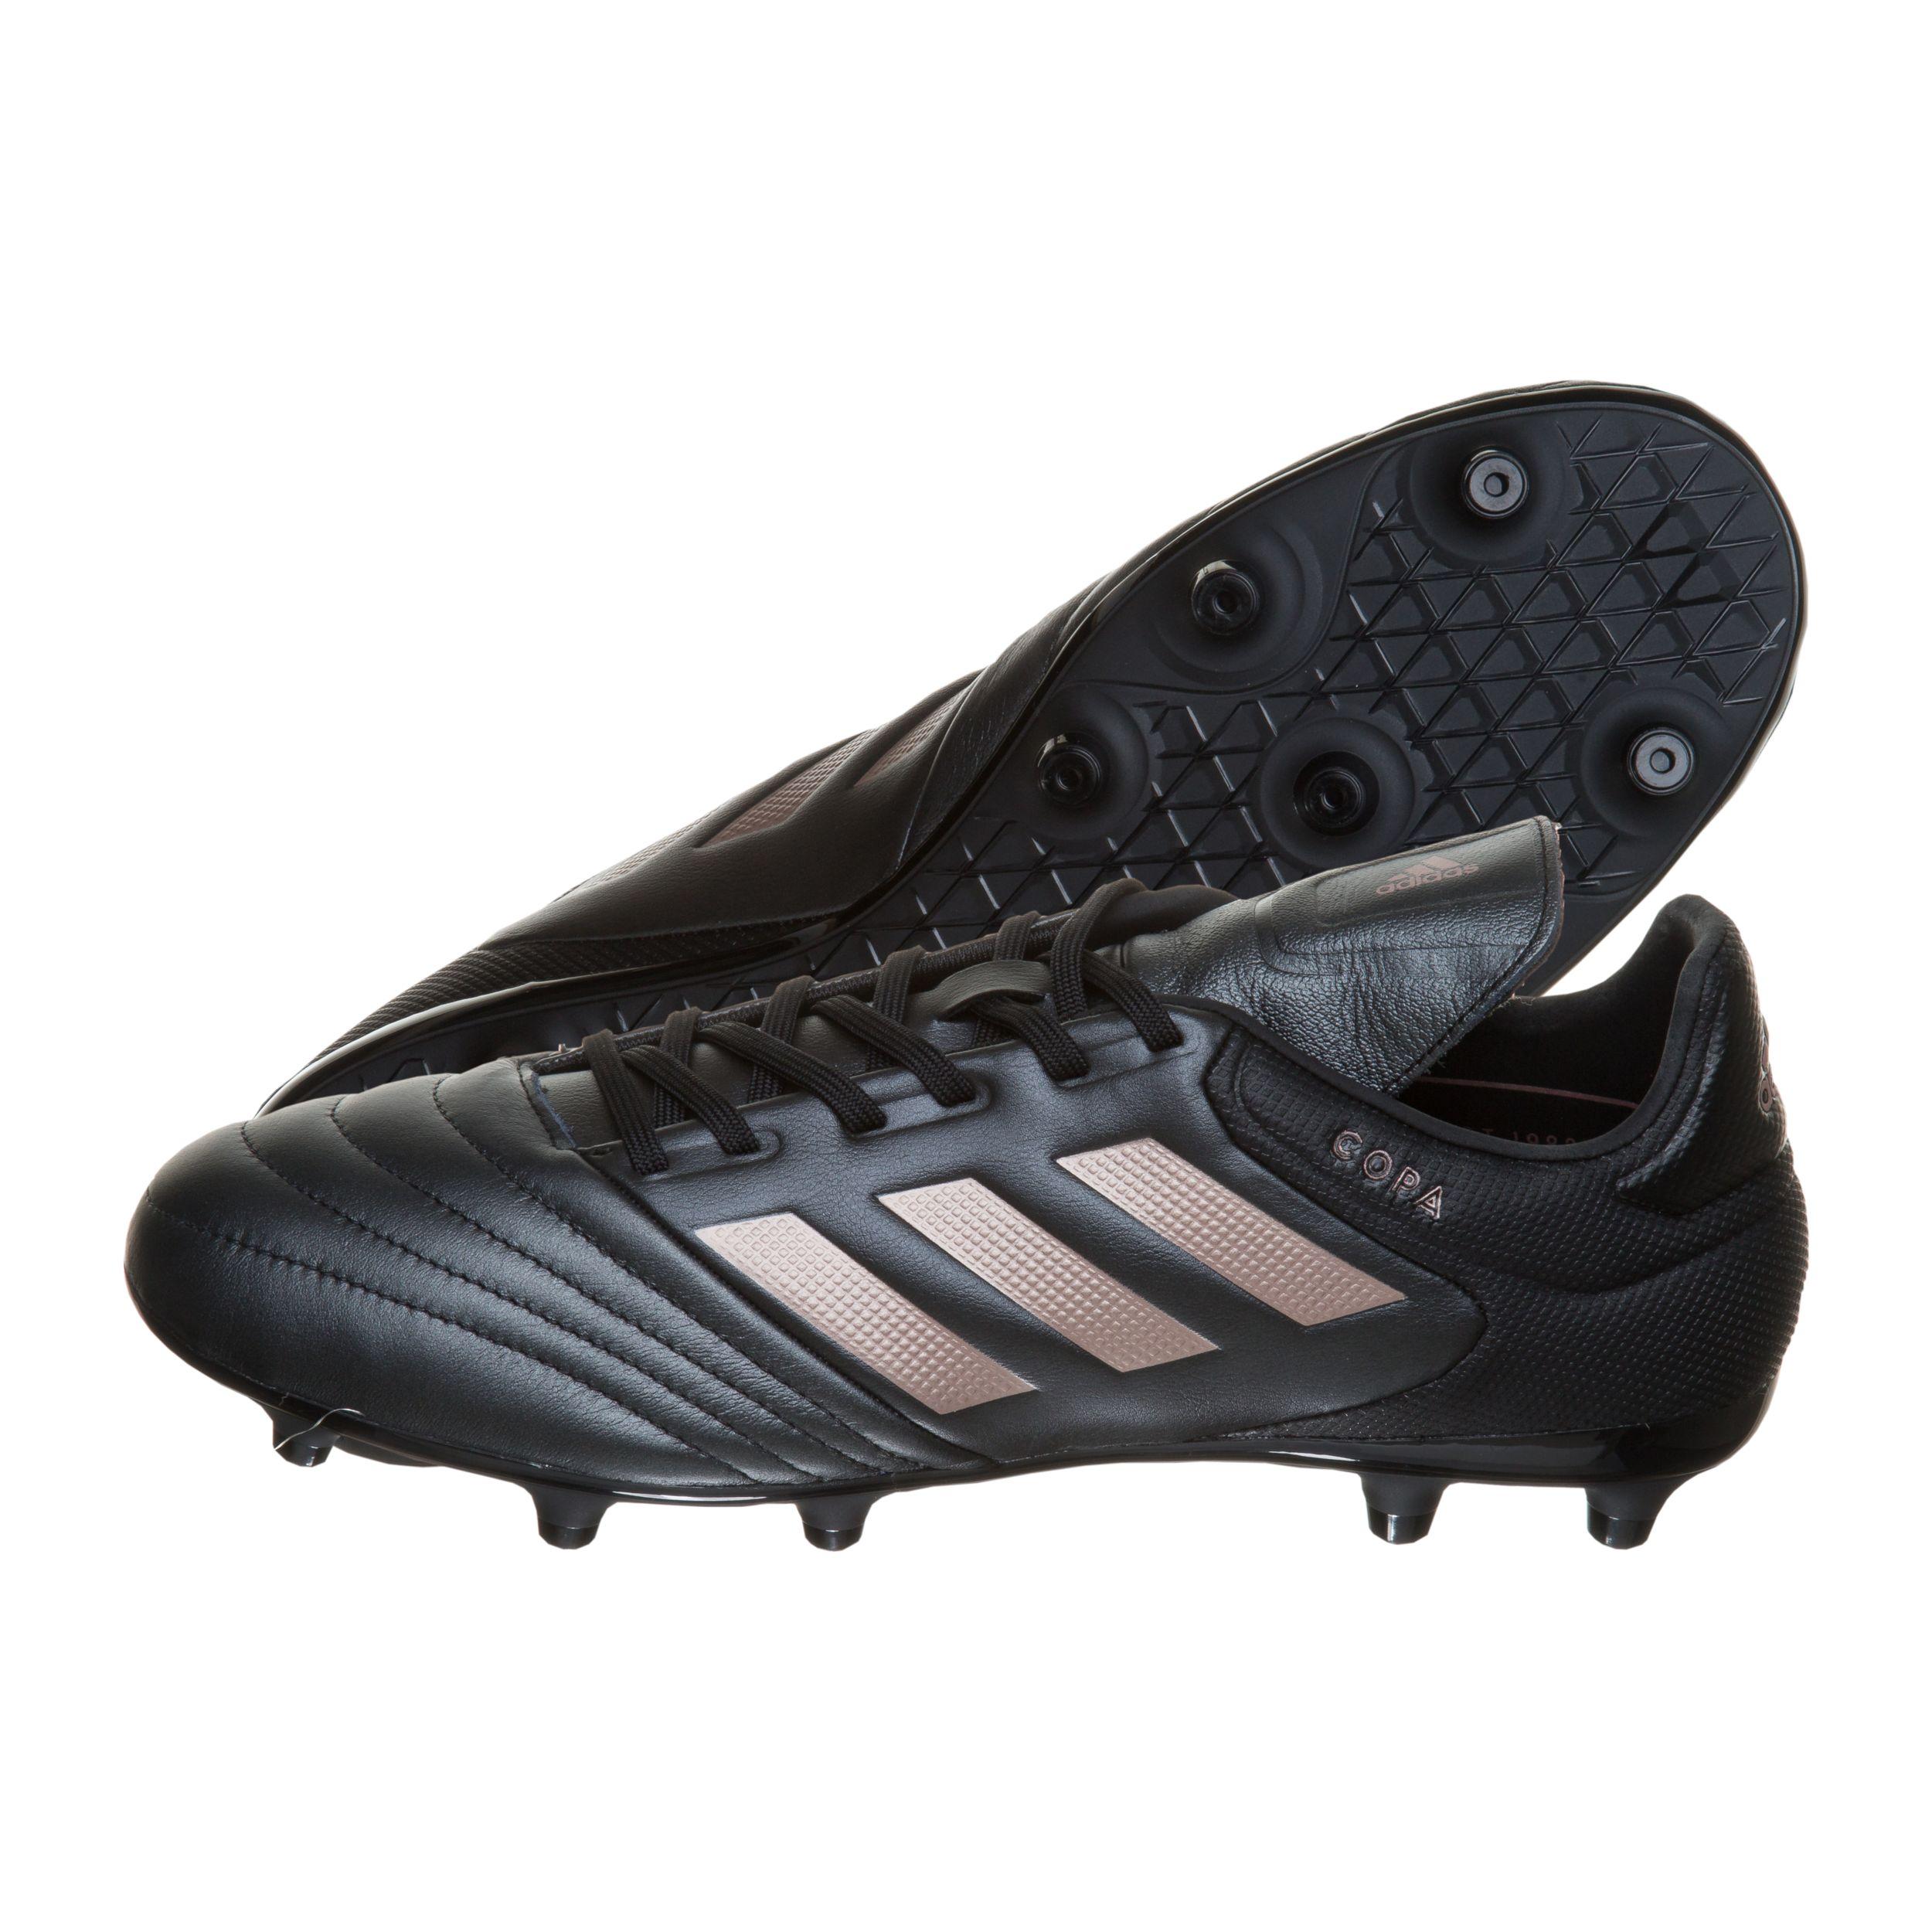 online store 23966 0873b Copa 17.3 FG 40 23